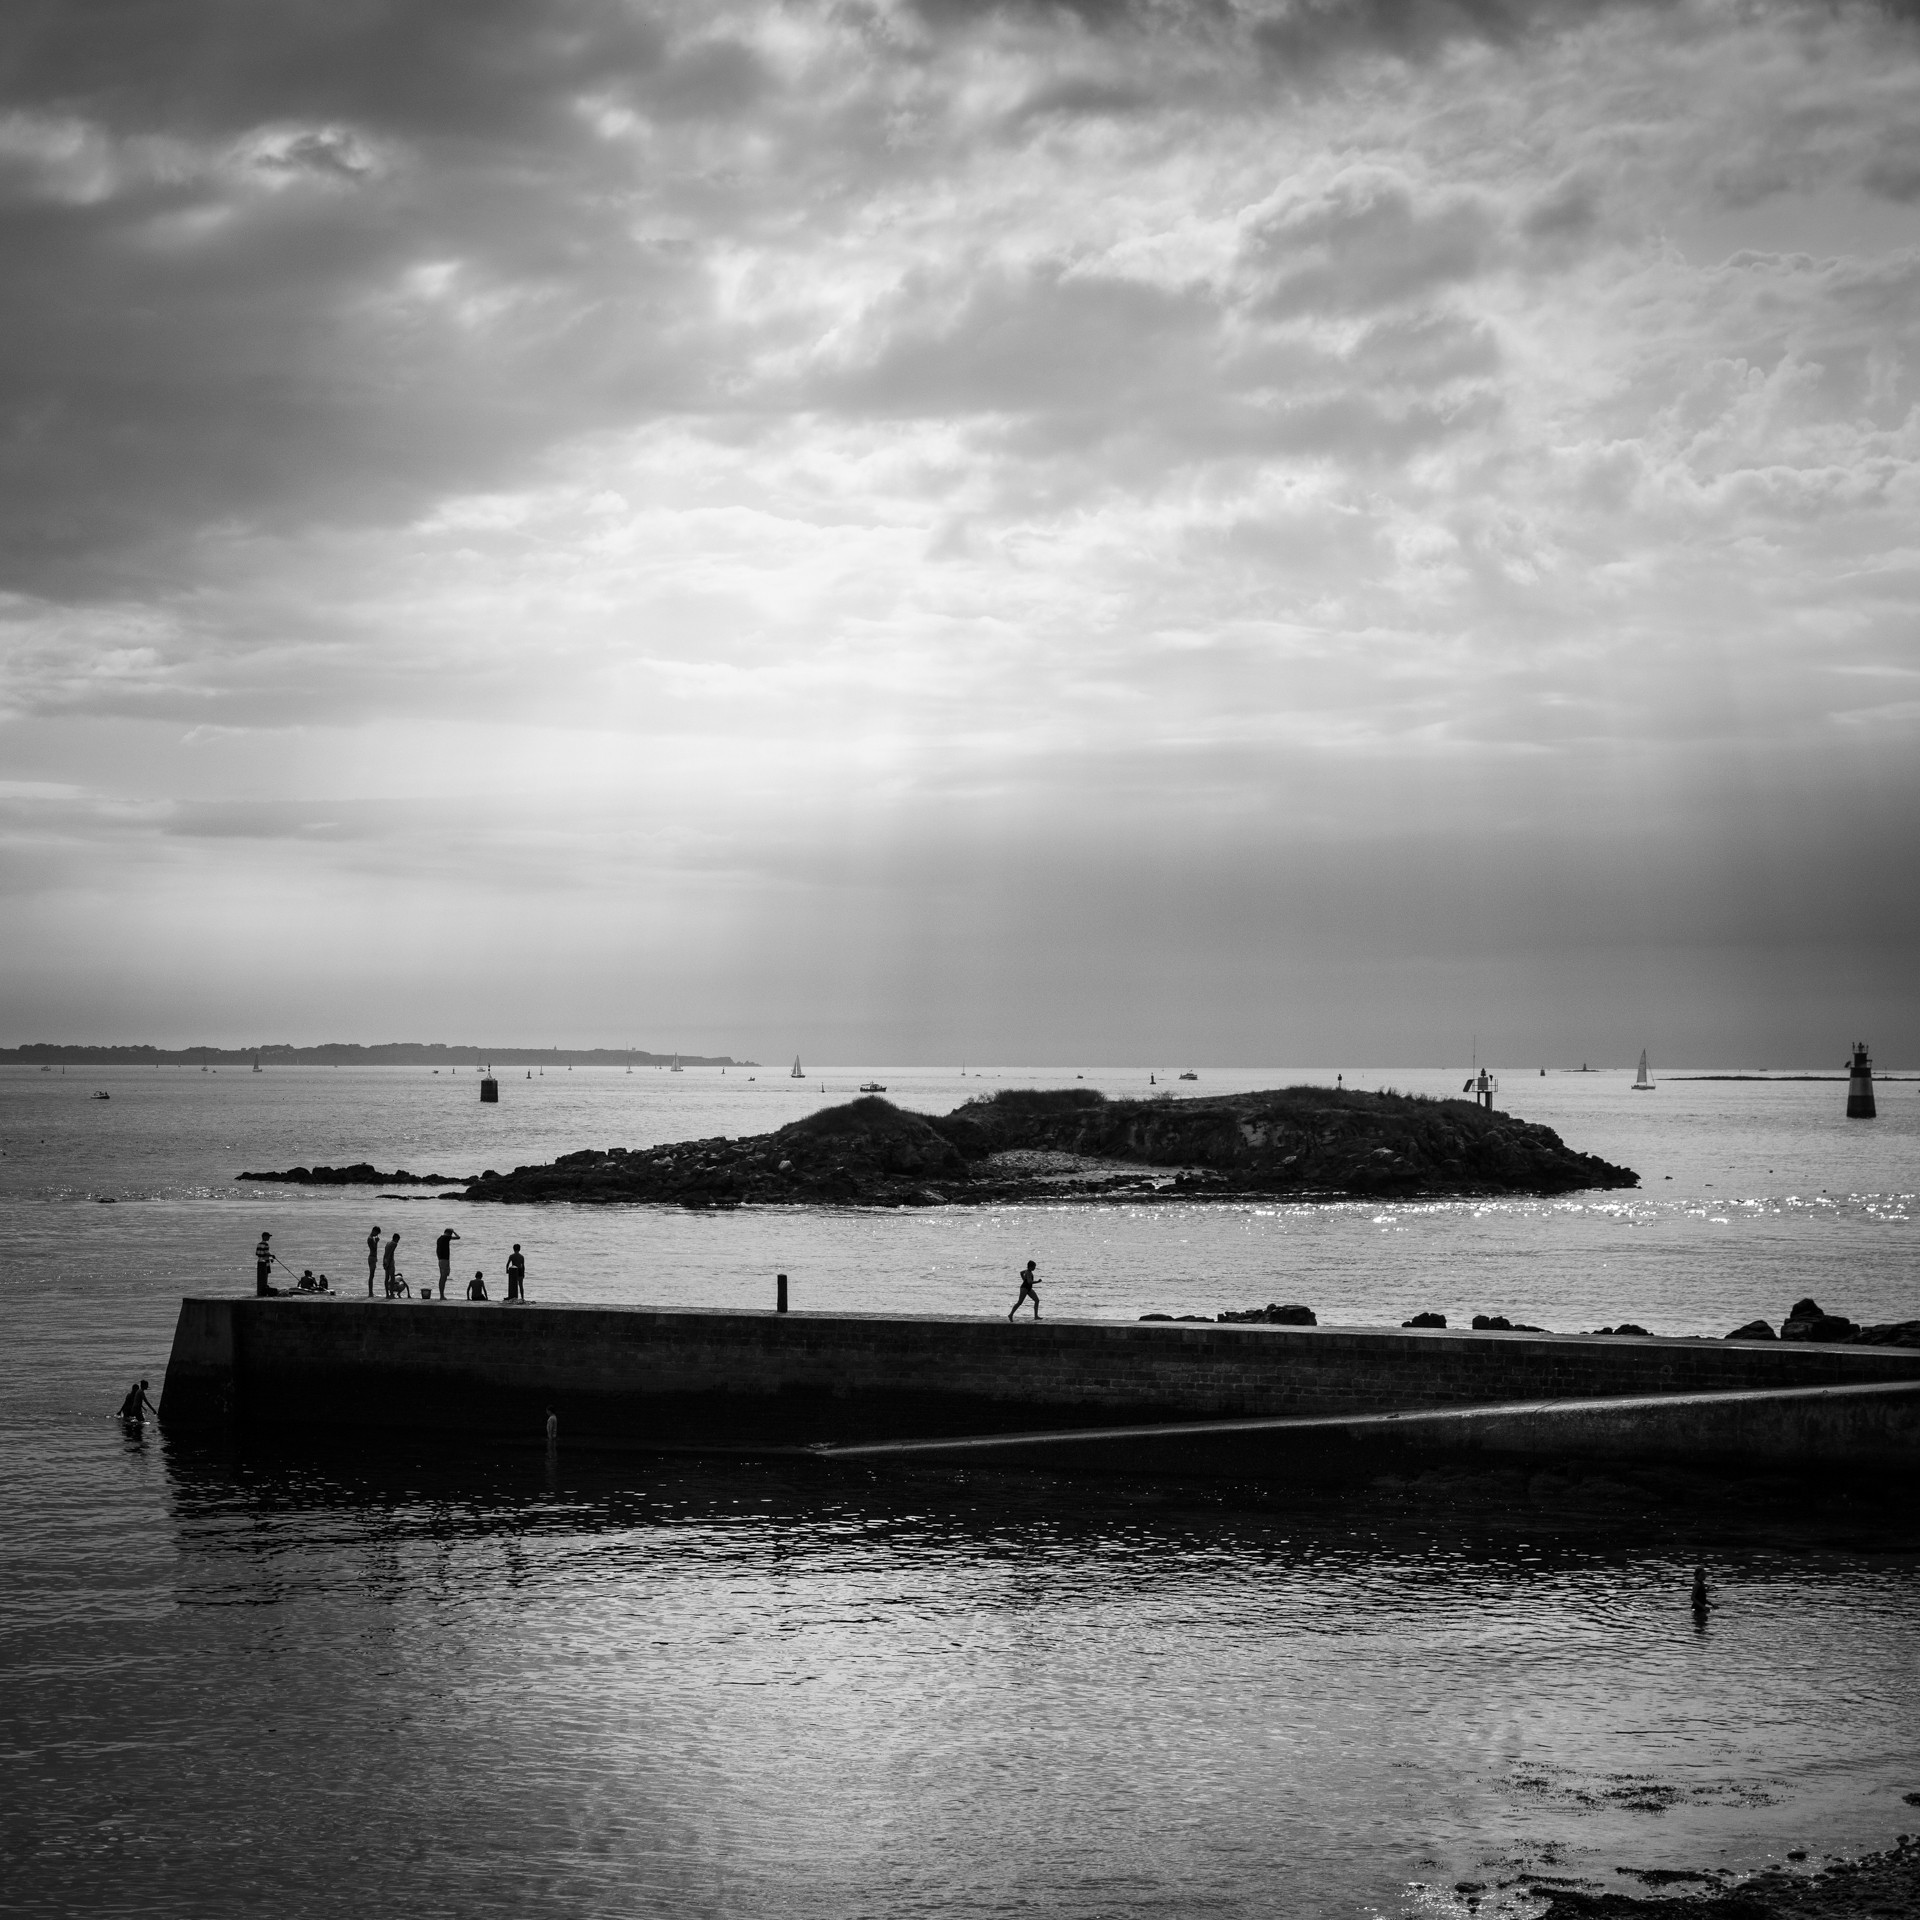 Port Louis #2 - Morbihan - Août 2020